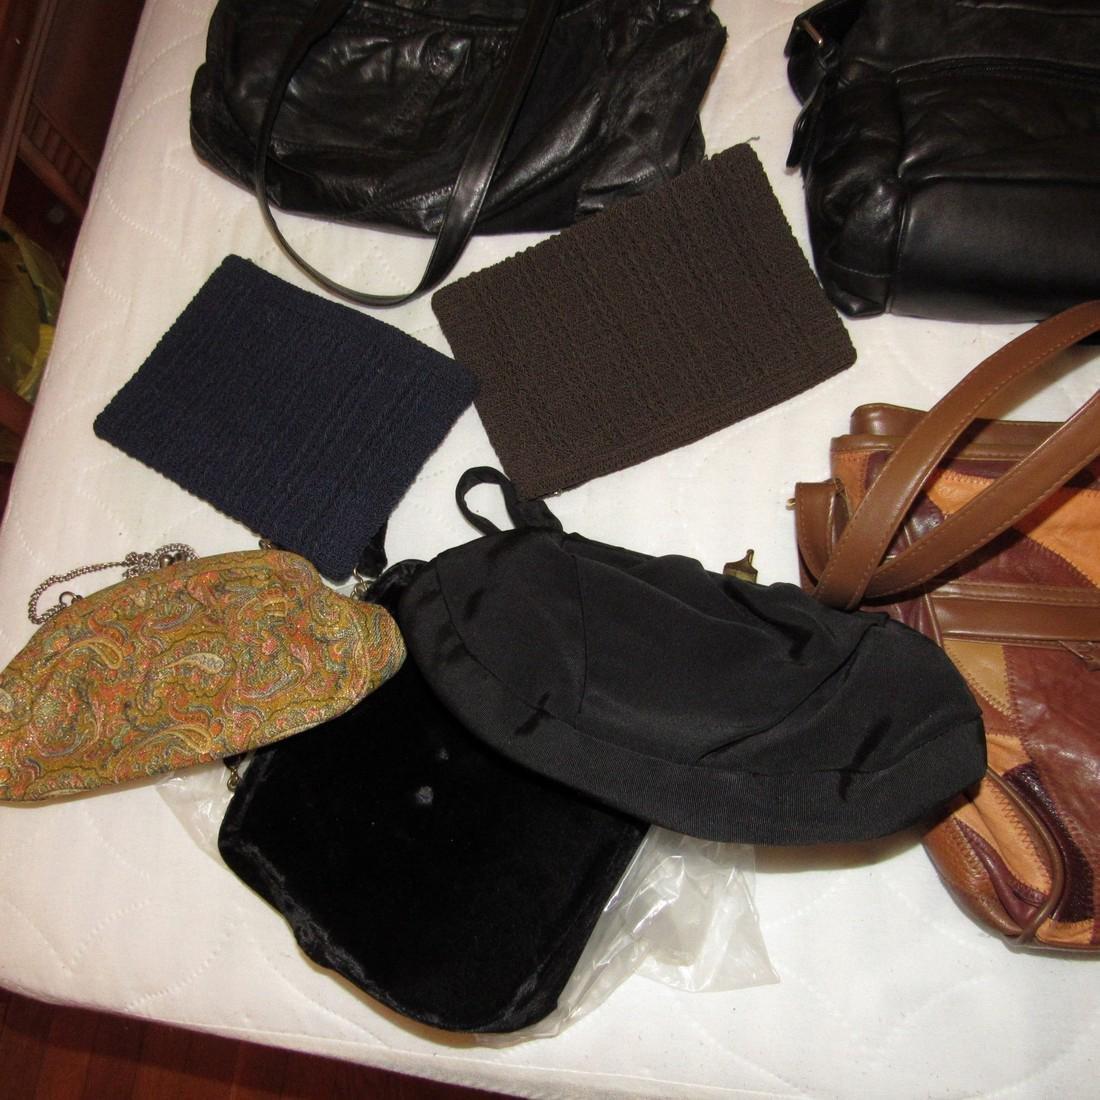 Vintage Purses and Handbags Lot - 5